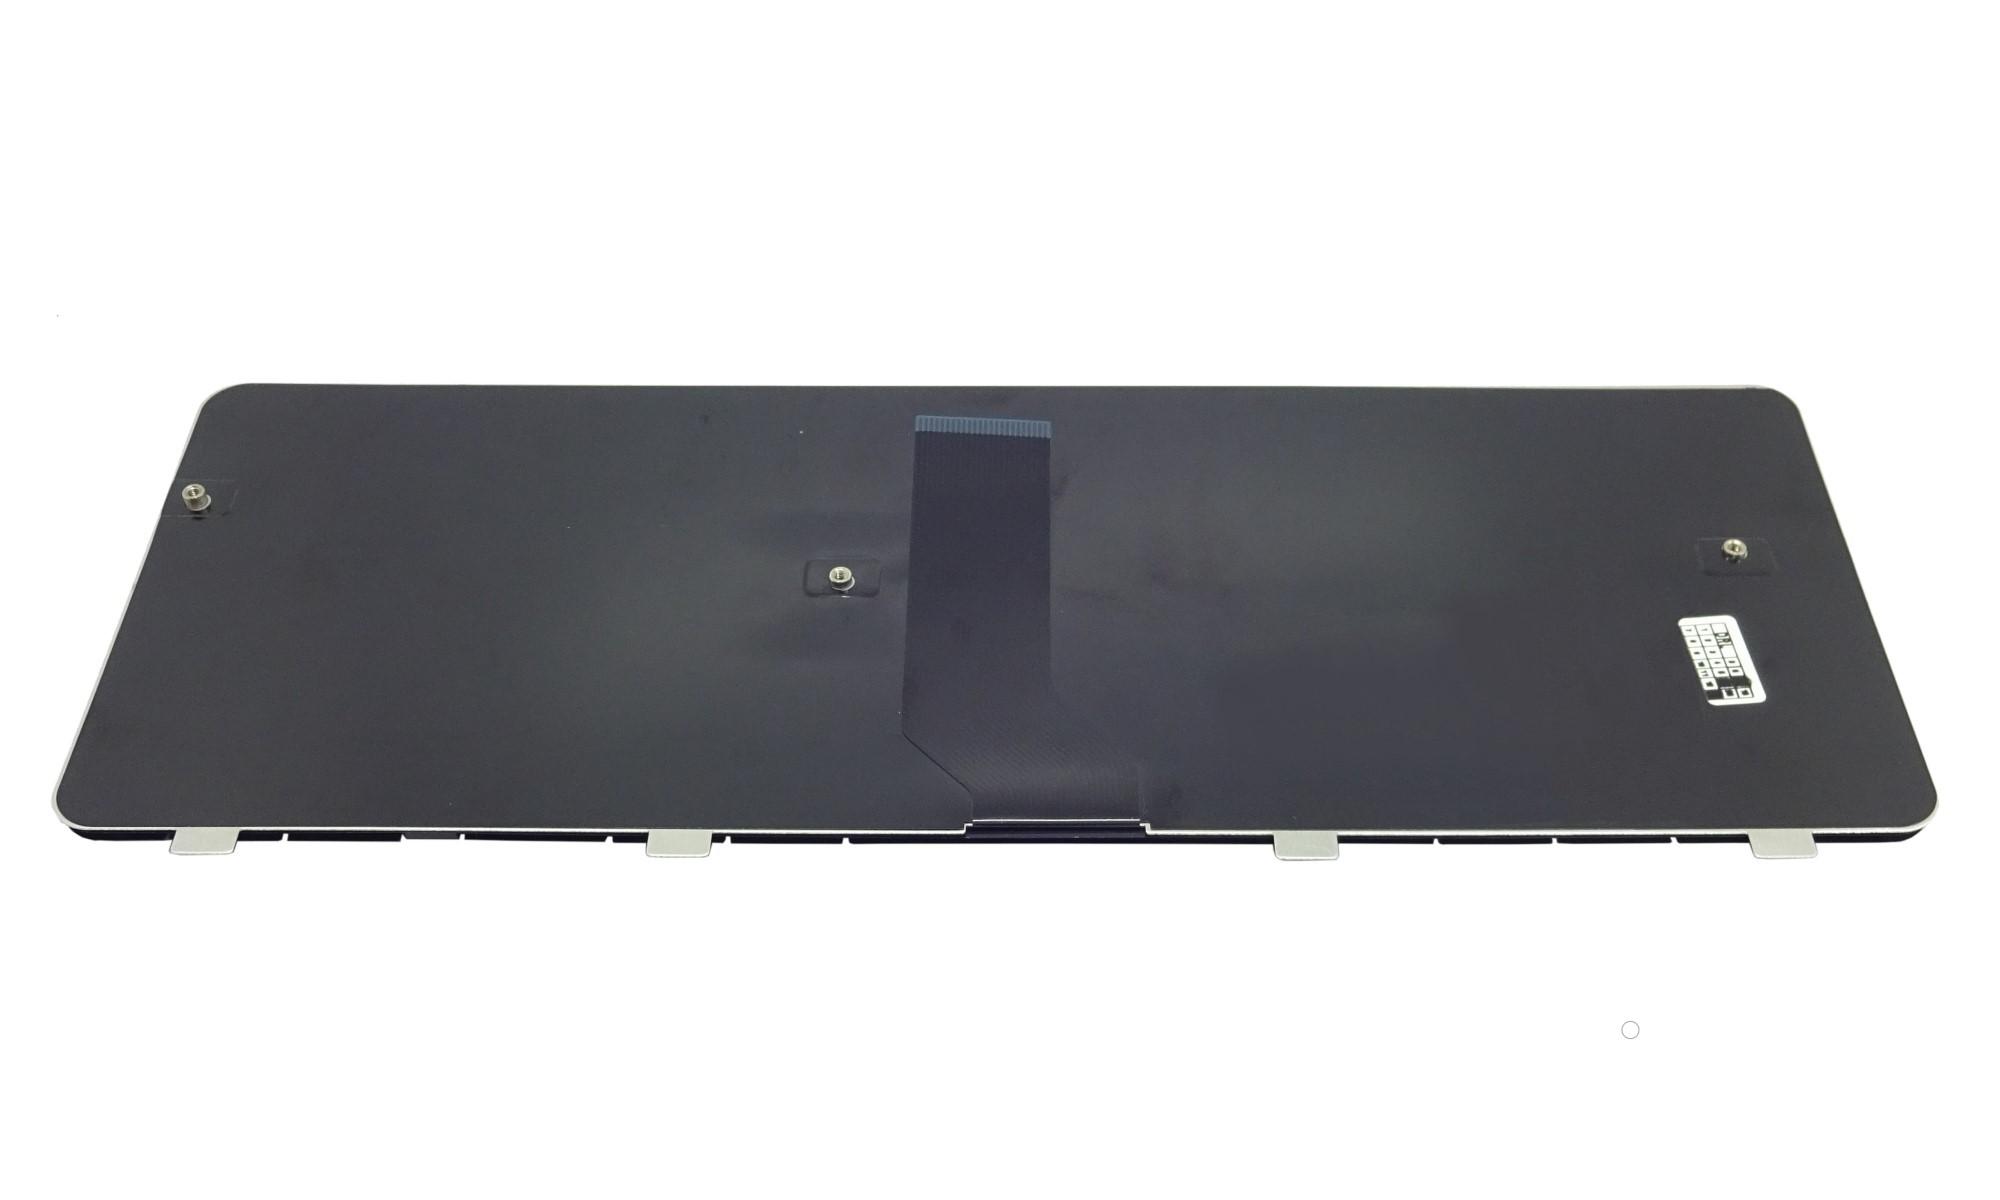 Tastatura compatibila HP Pavilion DV4-1000, negru mat